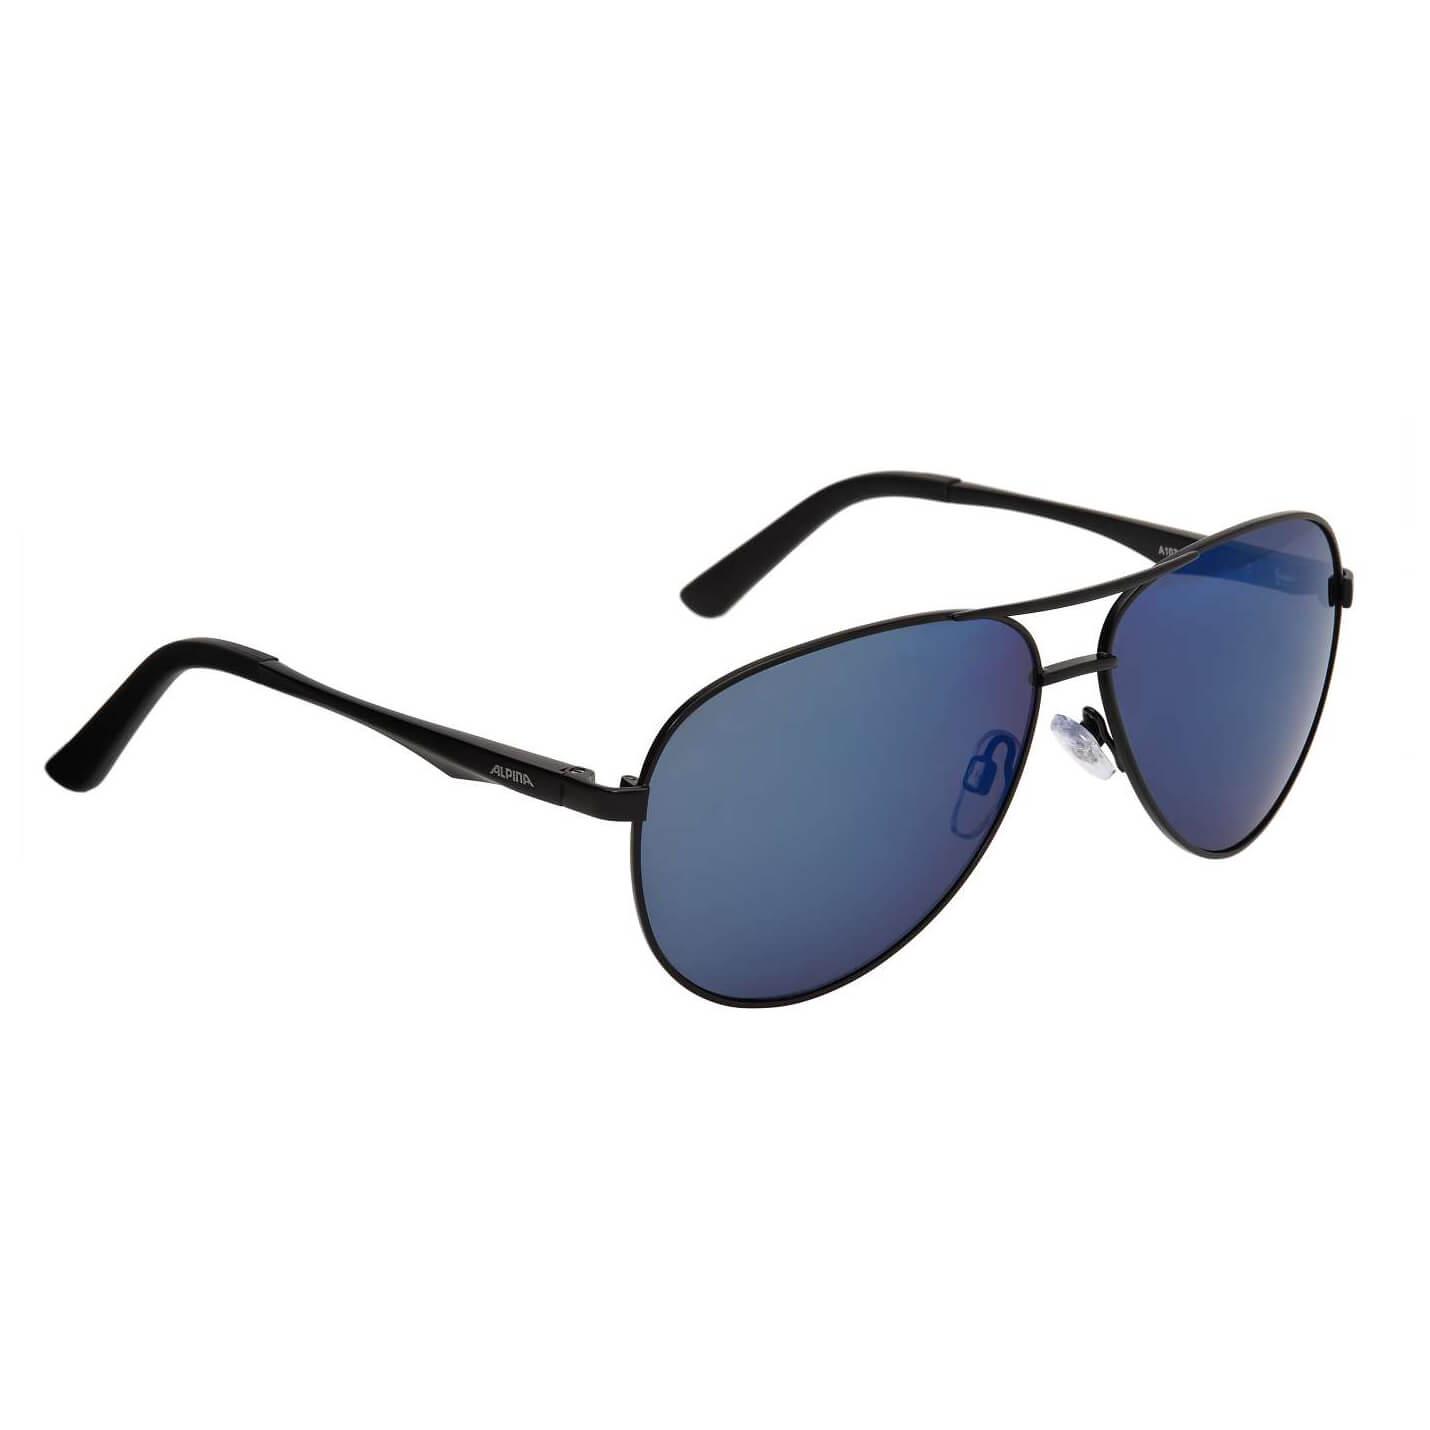 Alpina A Ceramic Mirror Blue S Sunglasses Buy Online - Alpina sunglasses for sale